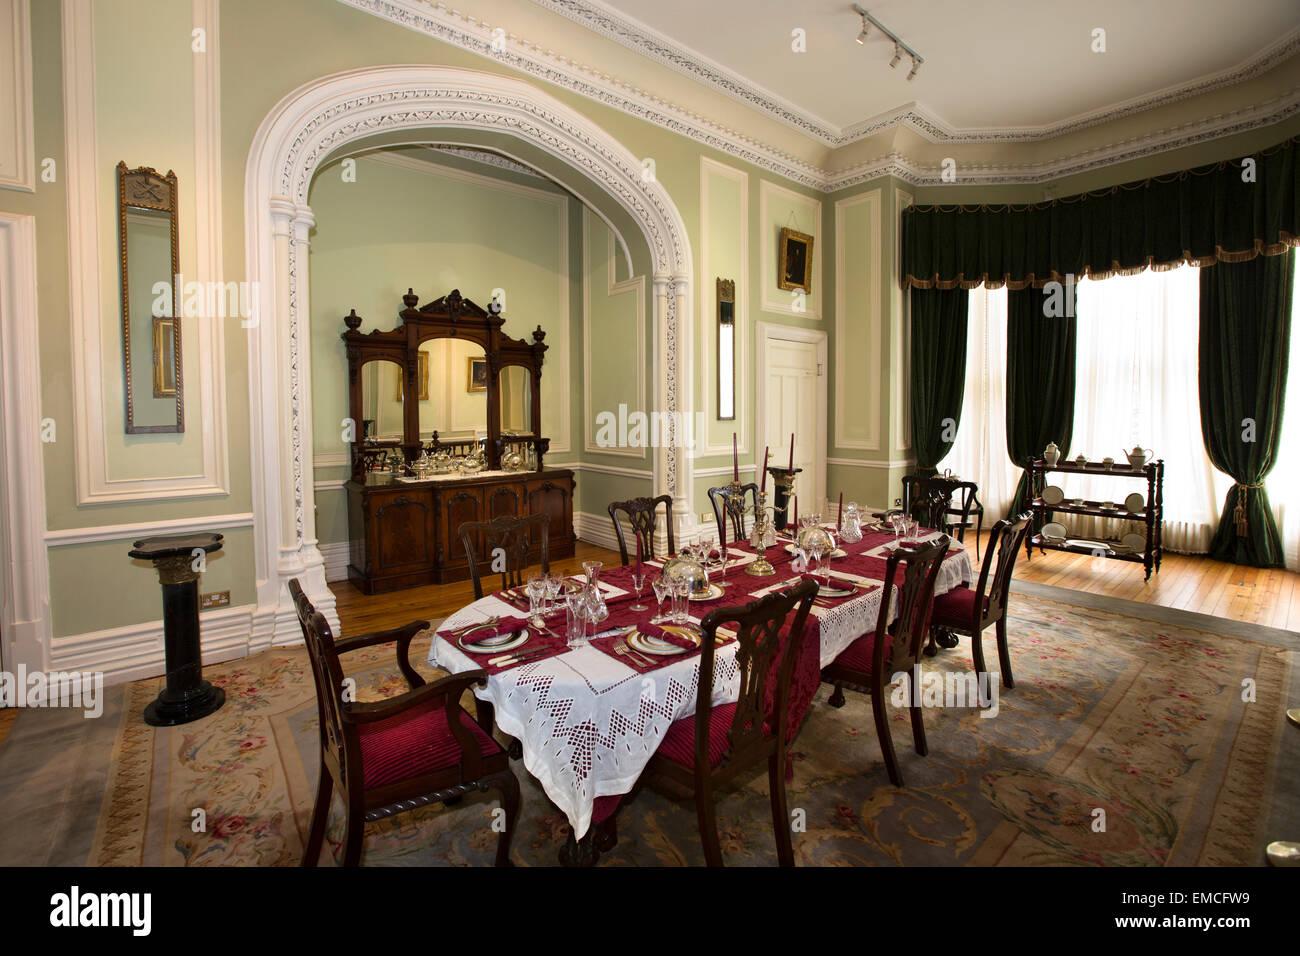 Irlanda, Co Galway, Connemara, Kylemore Abbey, Comedor con mesa Imagen De Stock